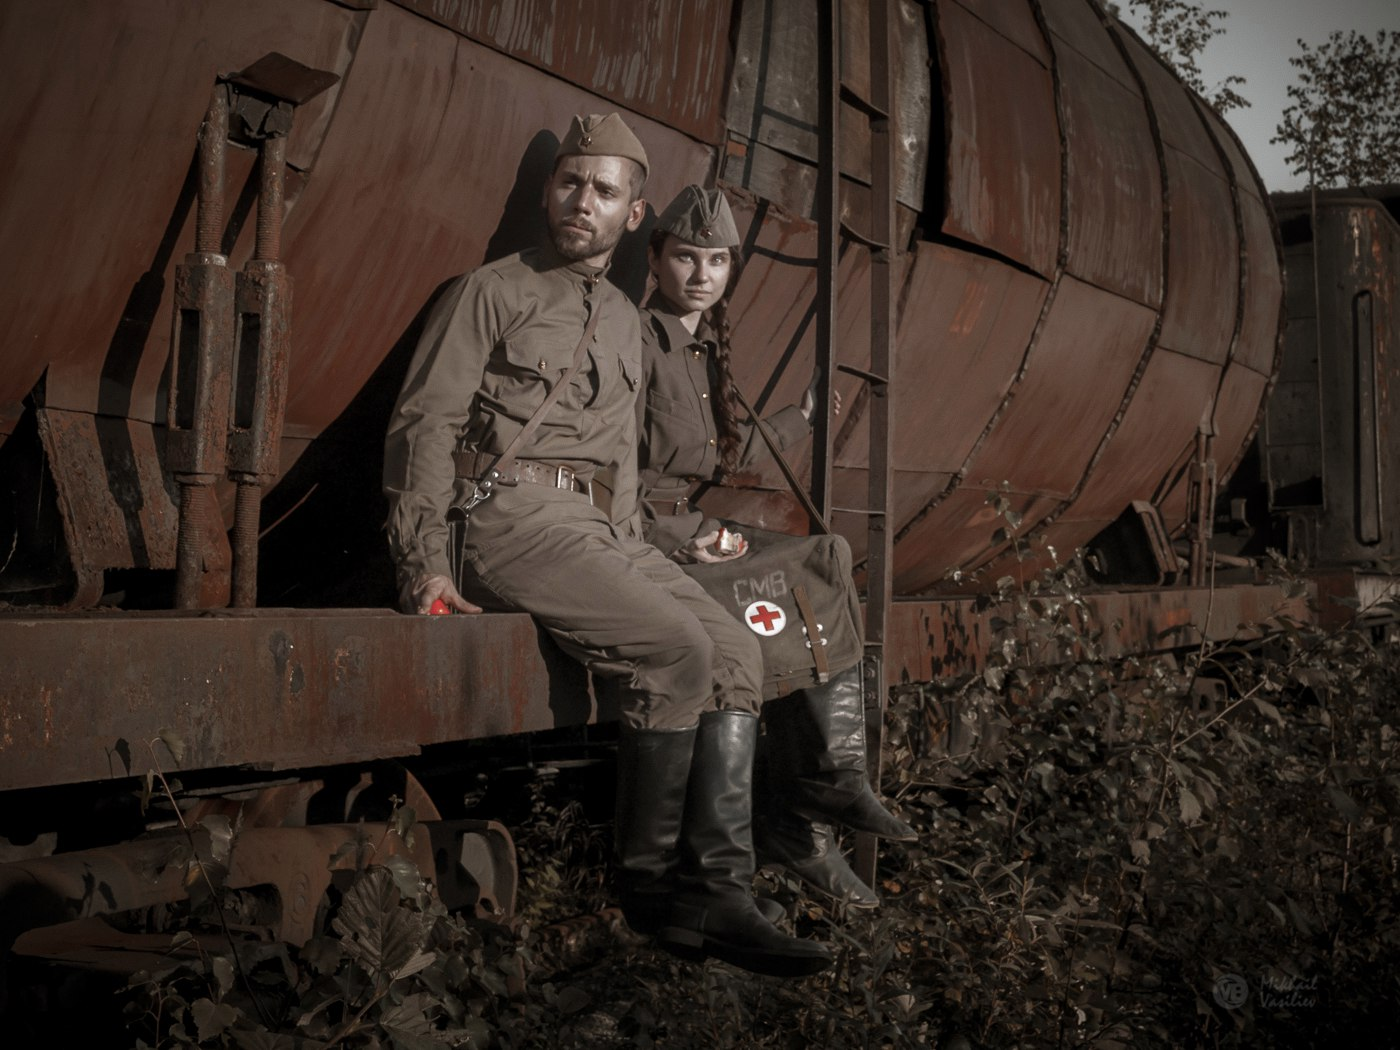 Кладбище паровозов, Шумково, Пермский край